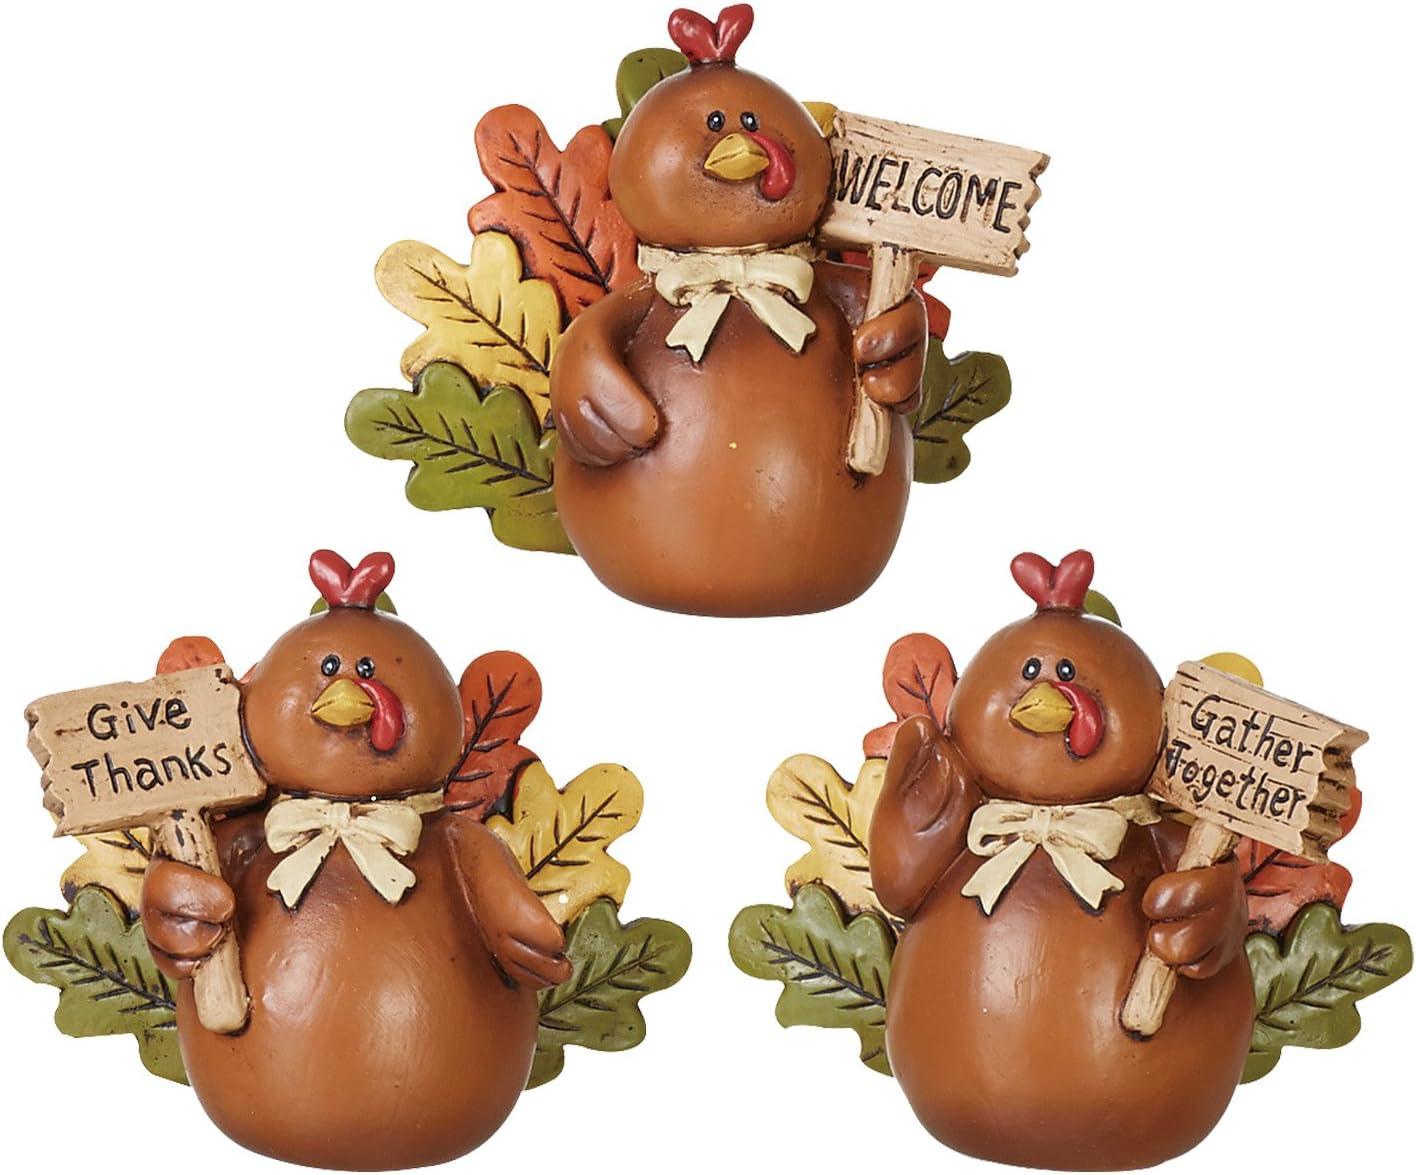 Thanksgiving Decoration - Set of 3 Turkey Decor Figures for Table Centerpiece or Shelf